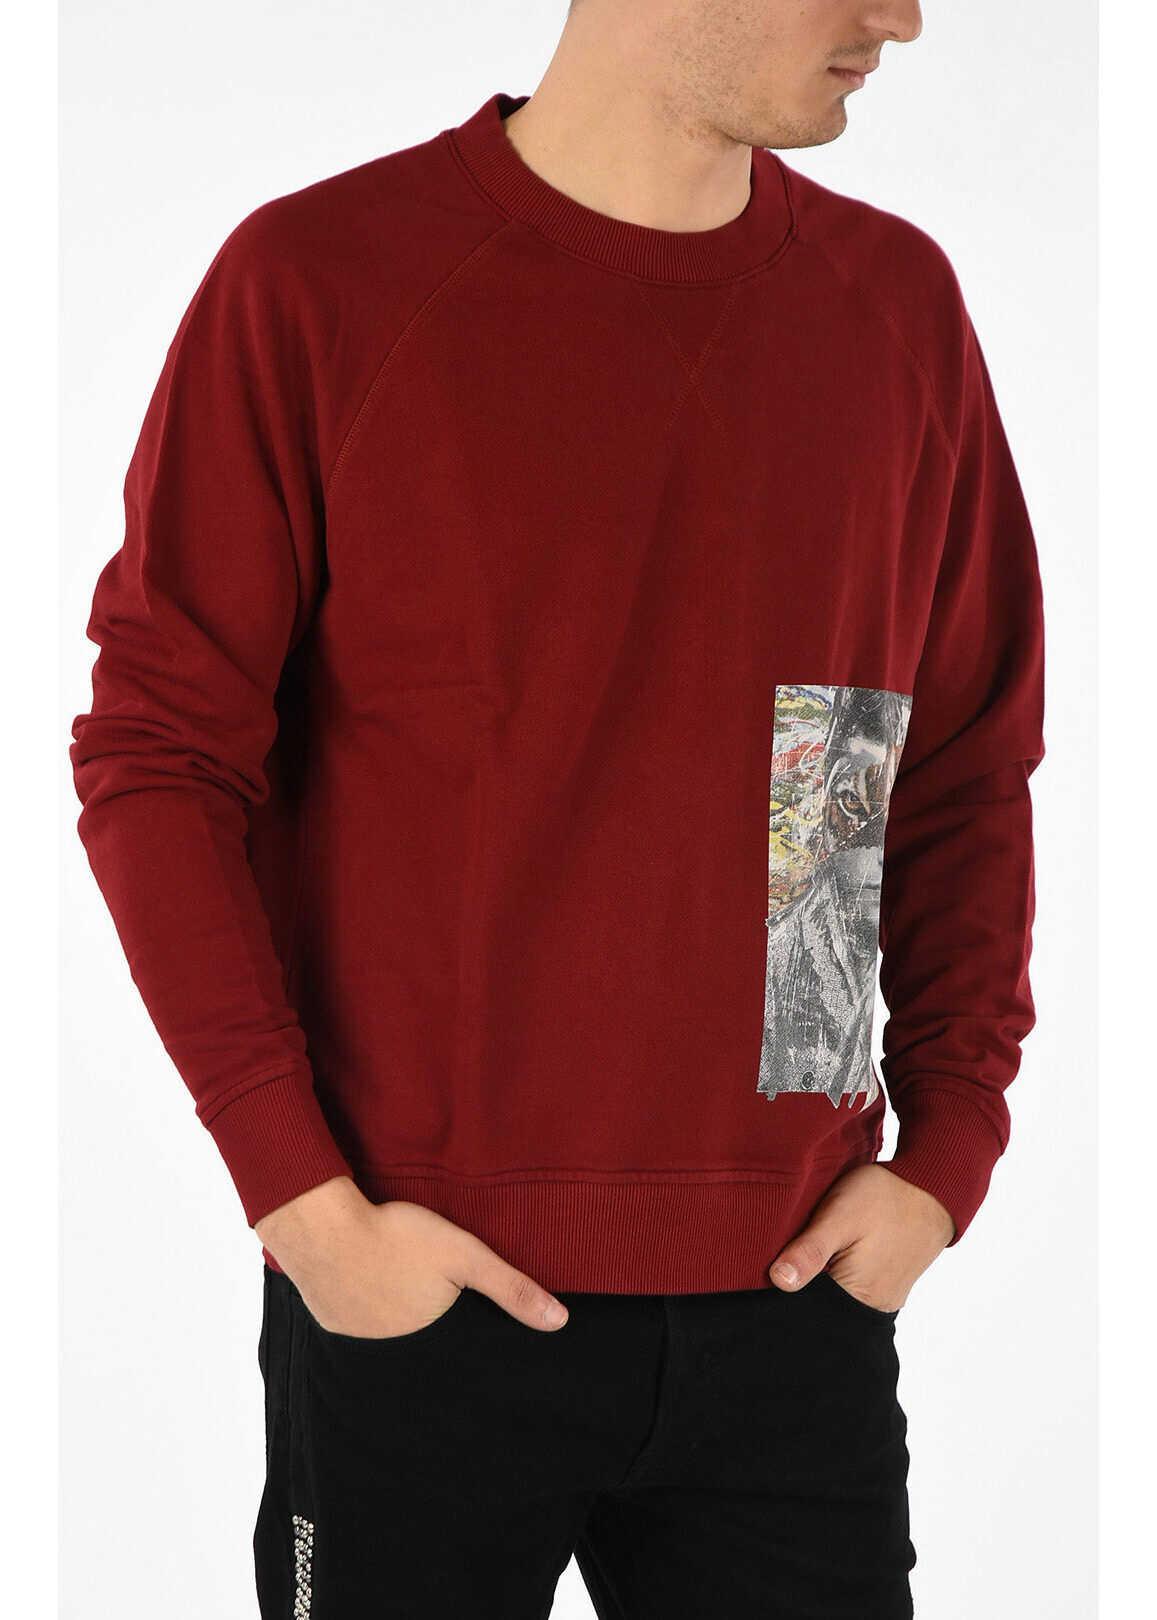 Just Cavalli Printed Crewneck Sweatshirt RED